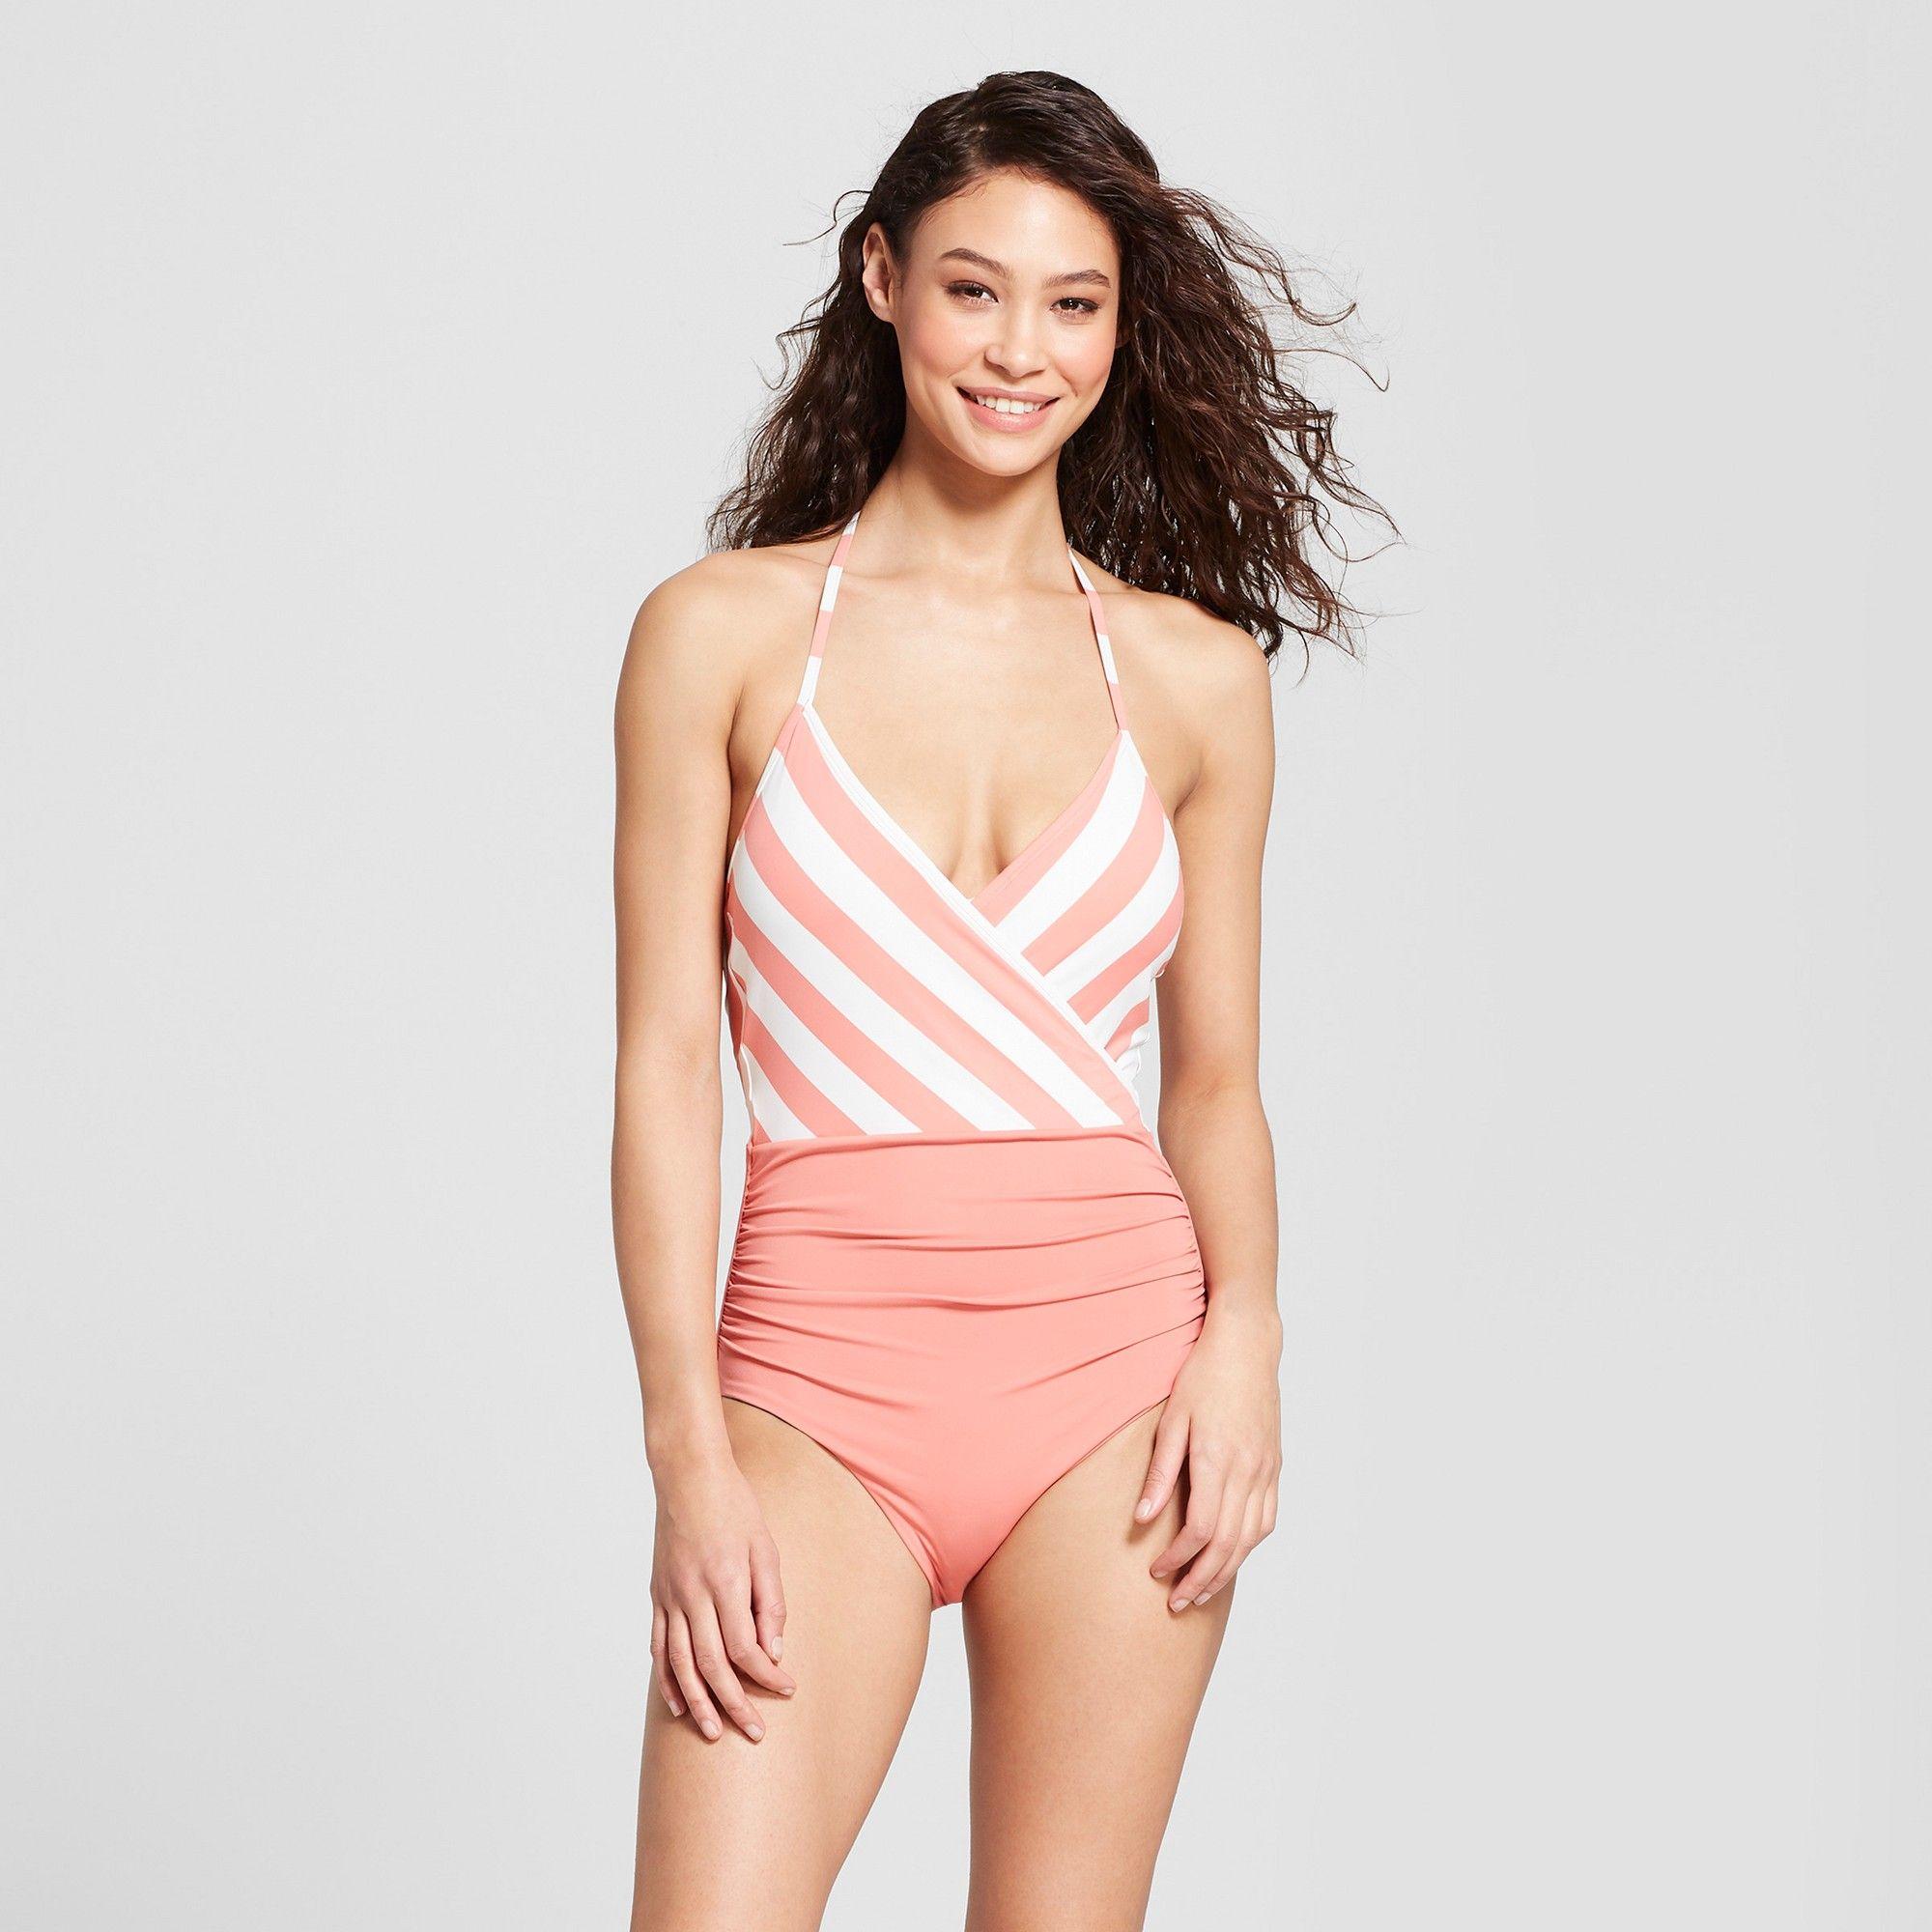 e68cfdb2ed78 Sunn Lab Swim Women's Striped Halter Wrap One Piece - Antique/Pearl XS, Pink